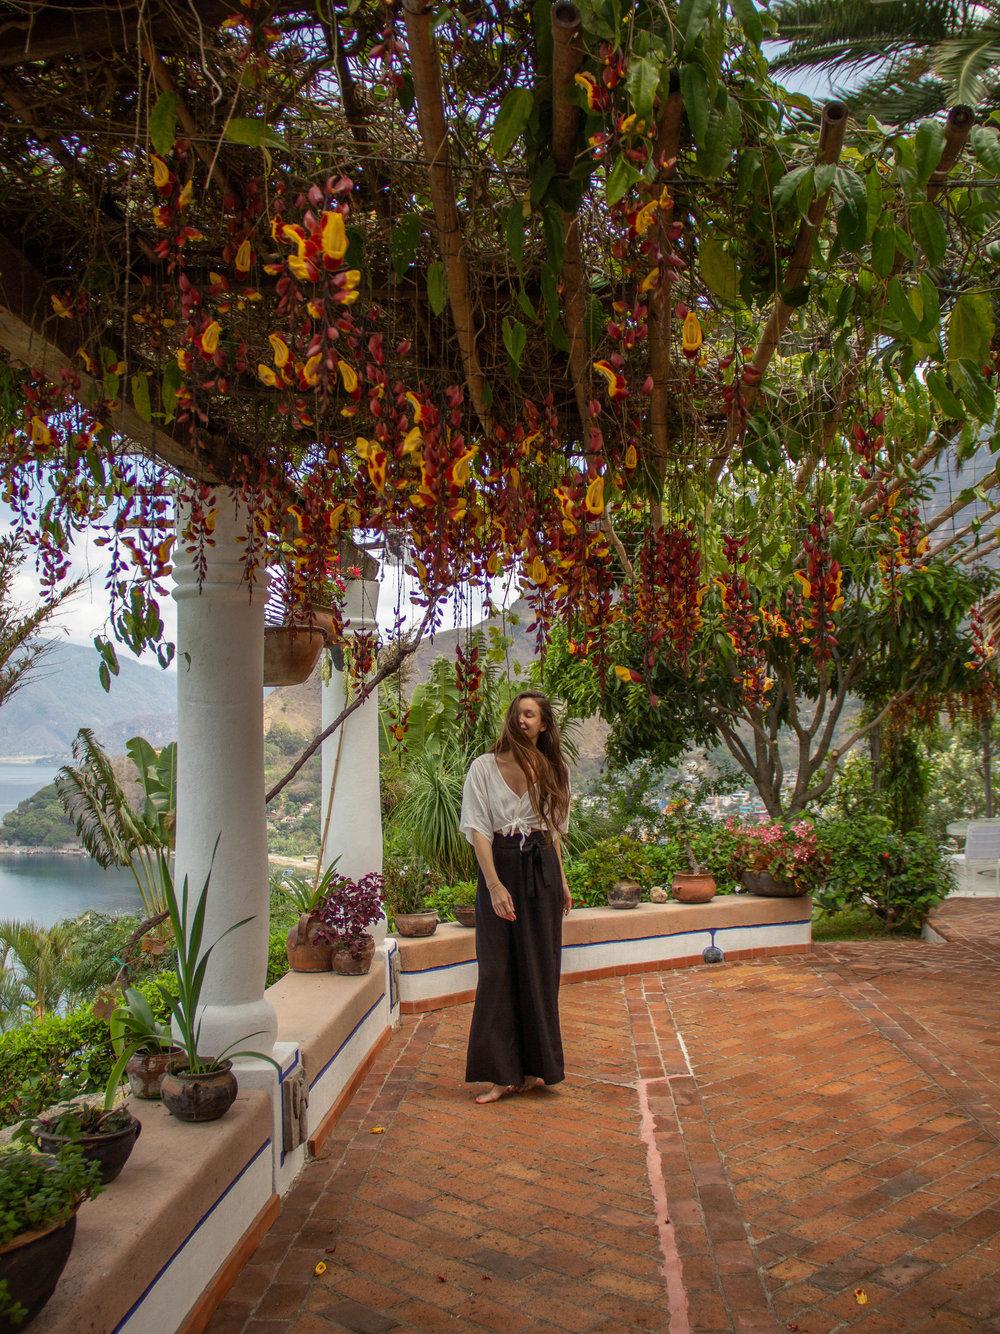 Garden Terrace at Tzampoc Resort